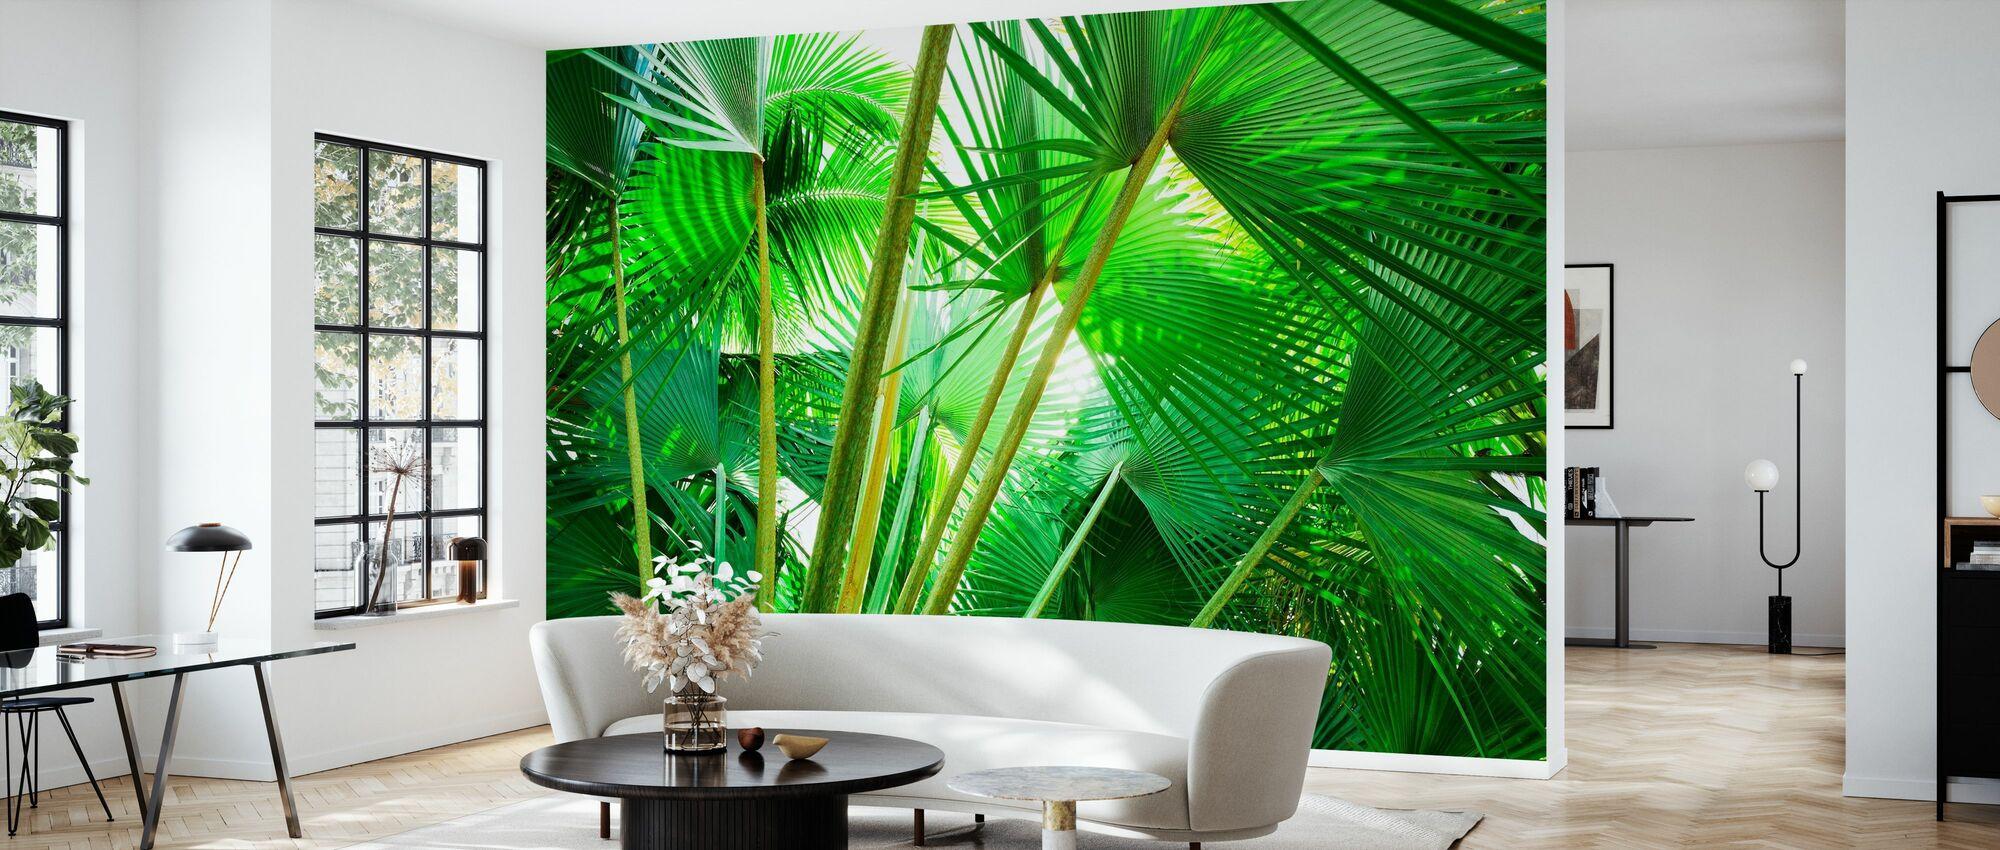 Palm Grove - Behang - Woonkamer